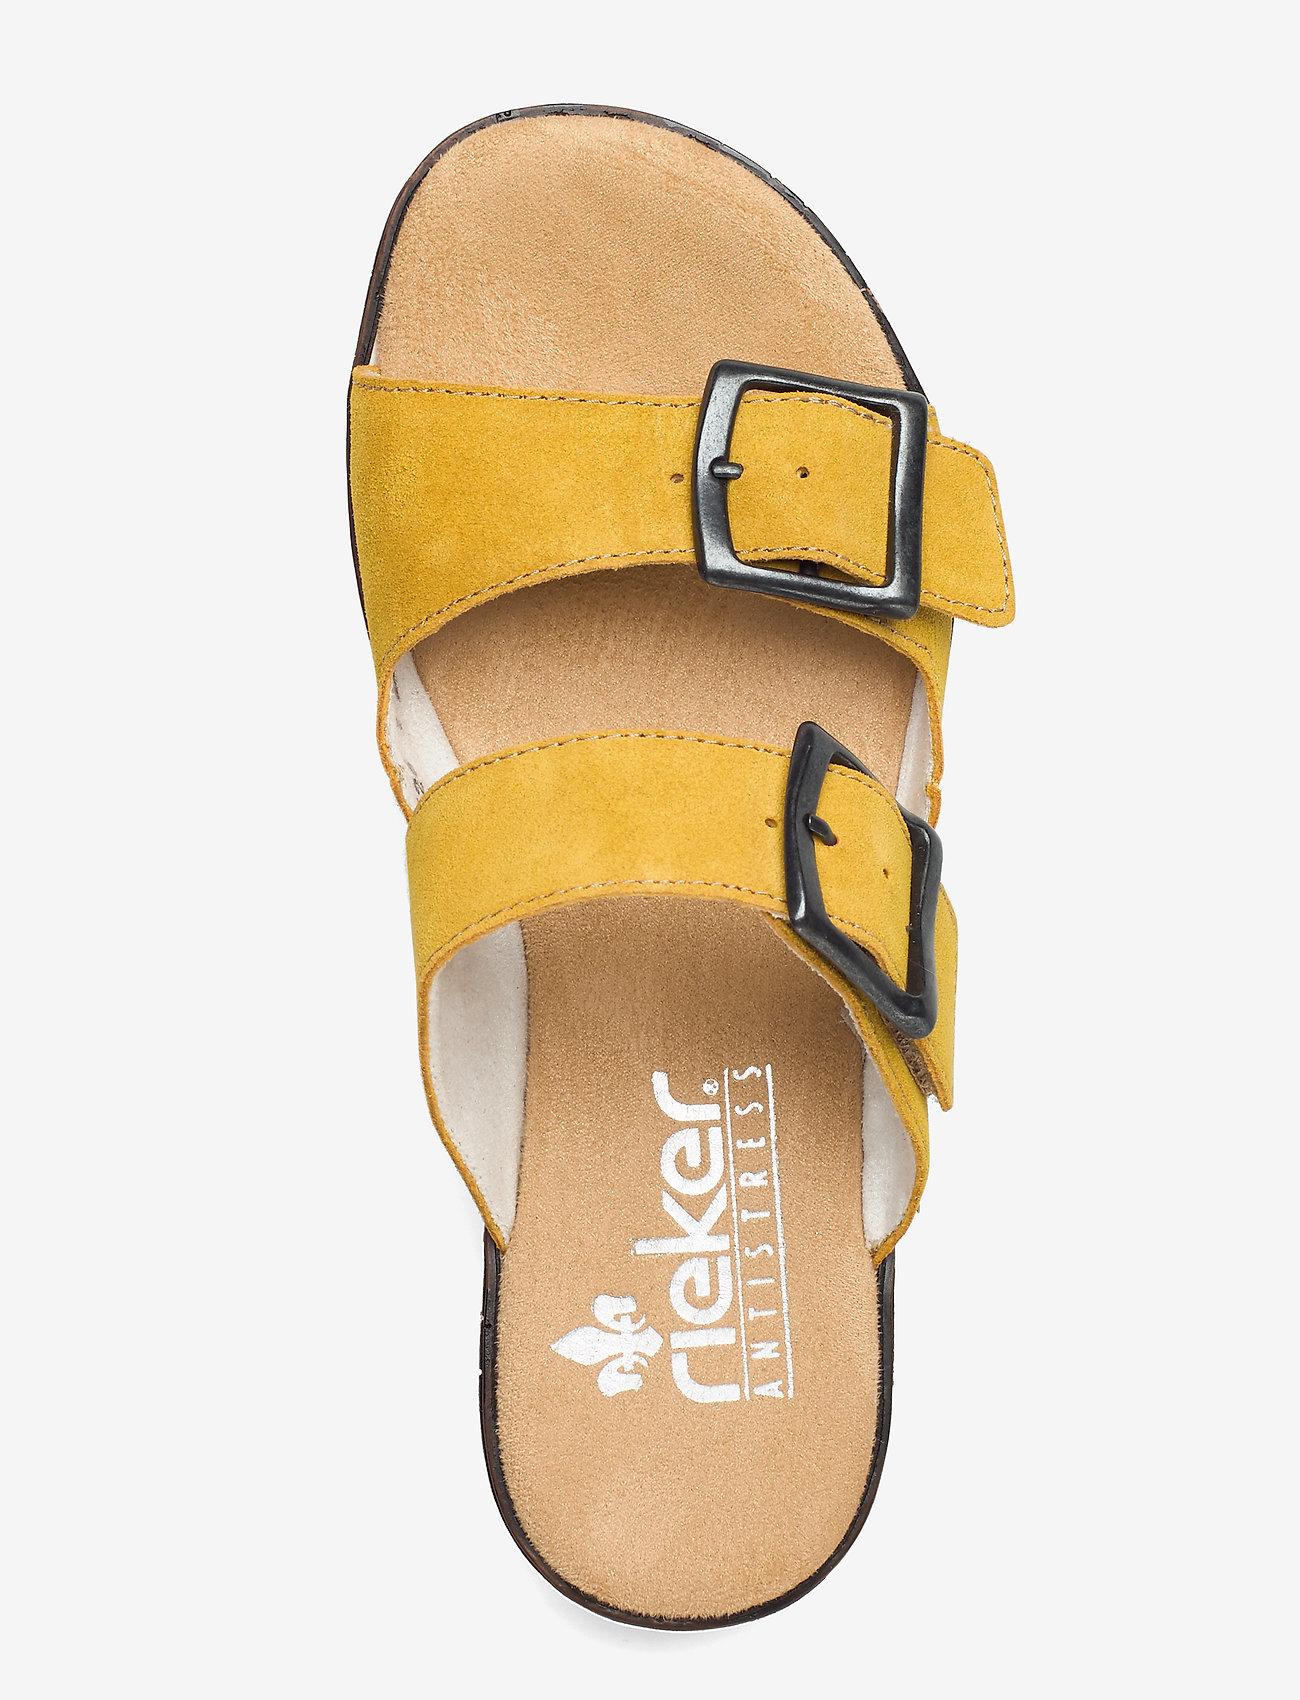 63694-68 (Yellow) - Rieker